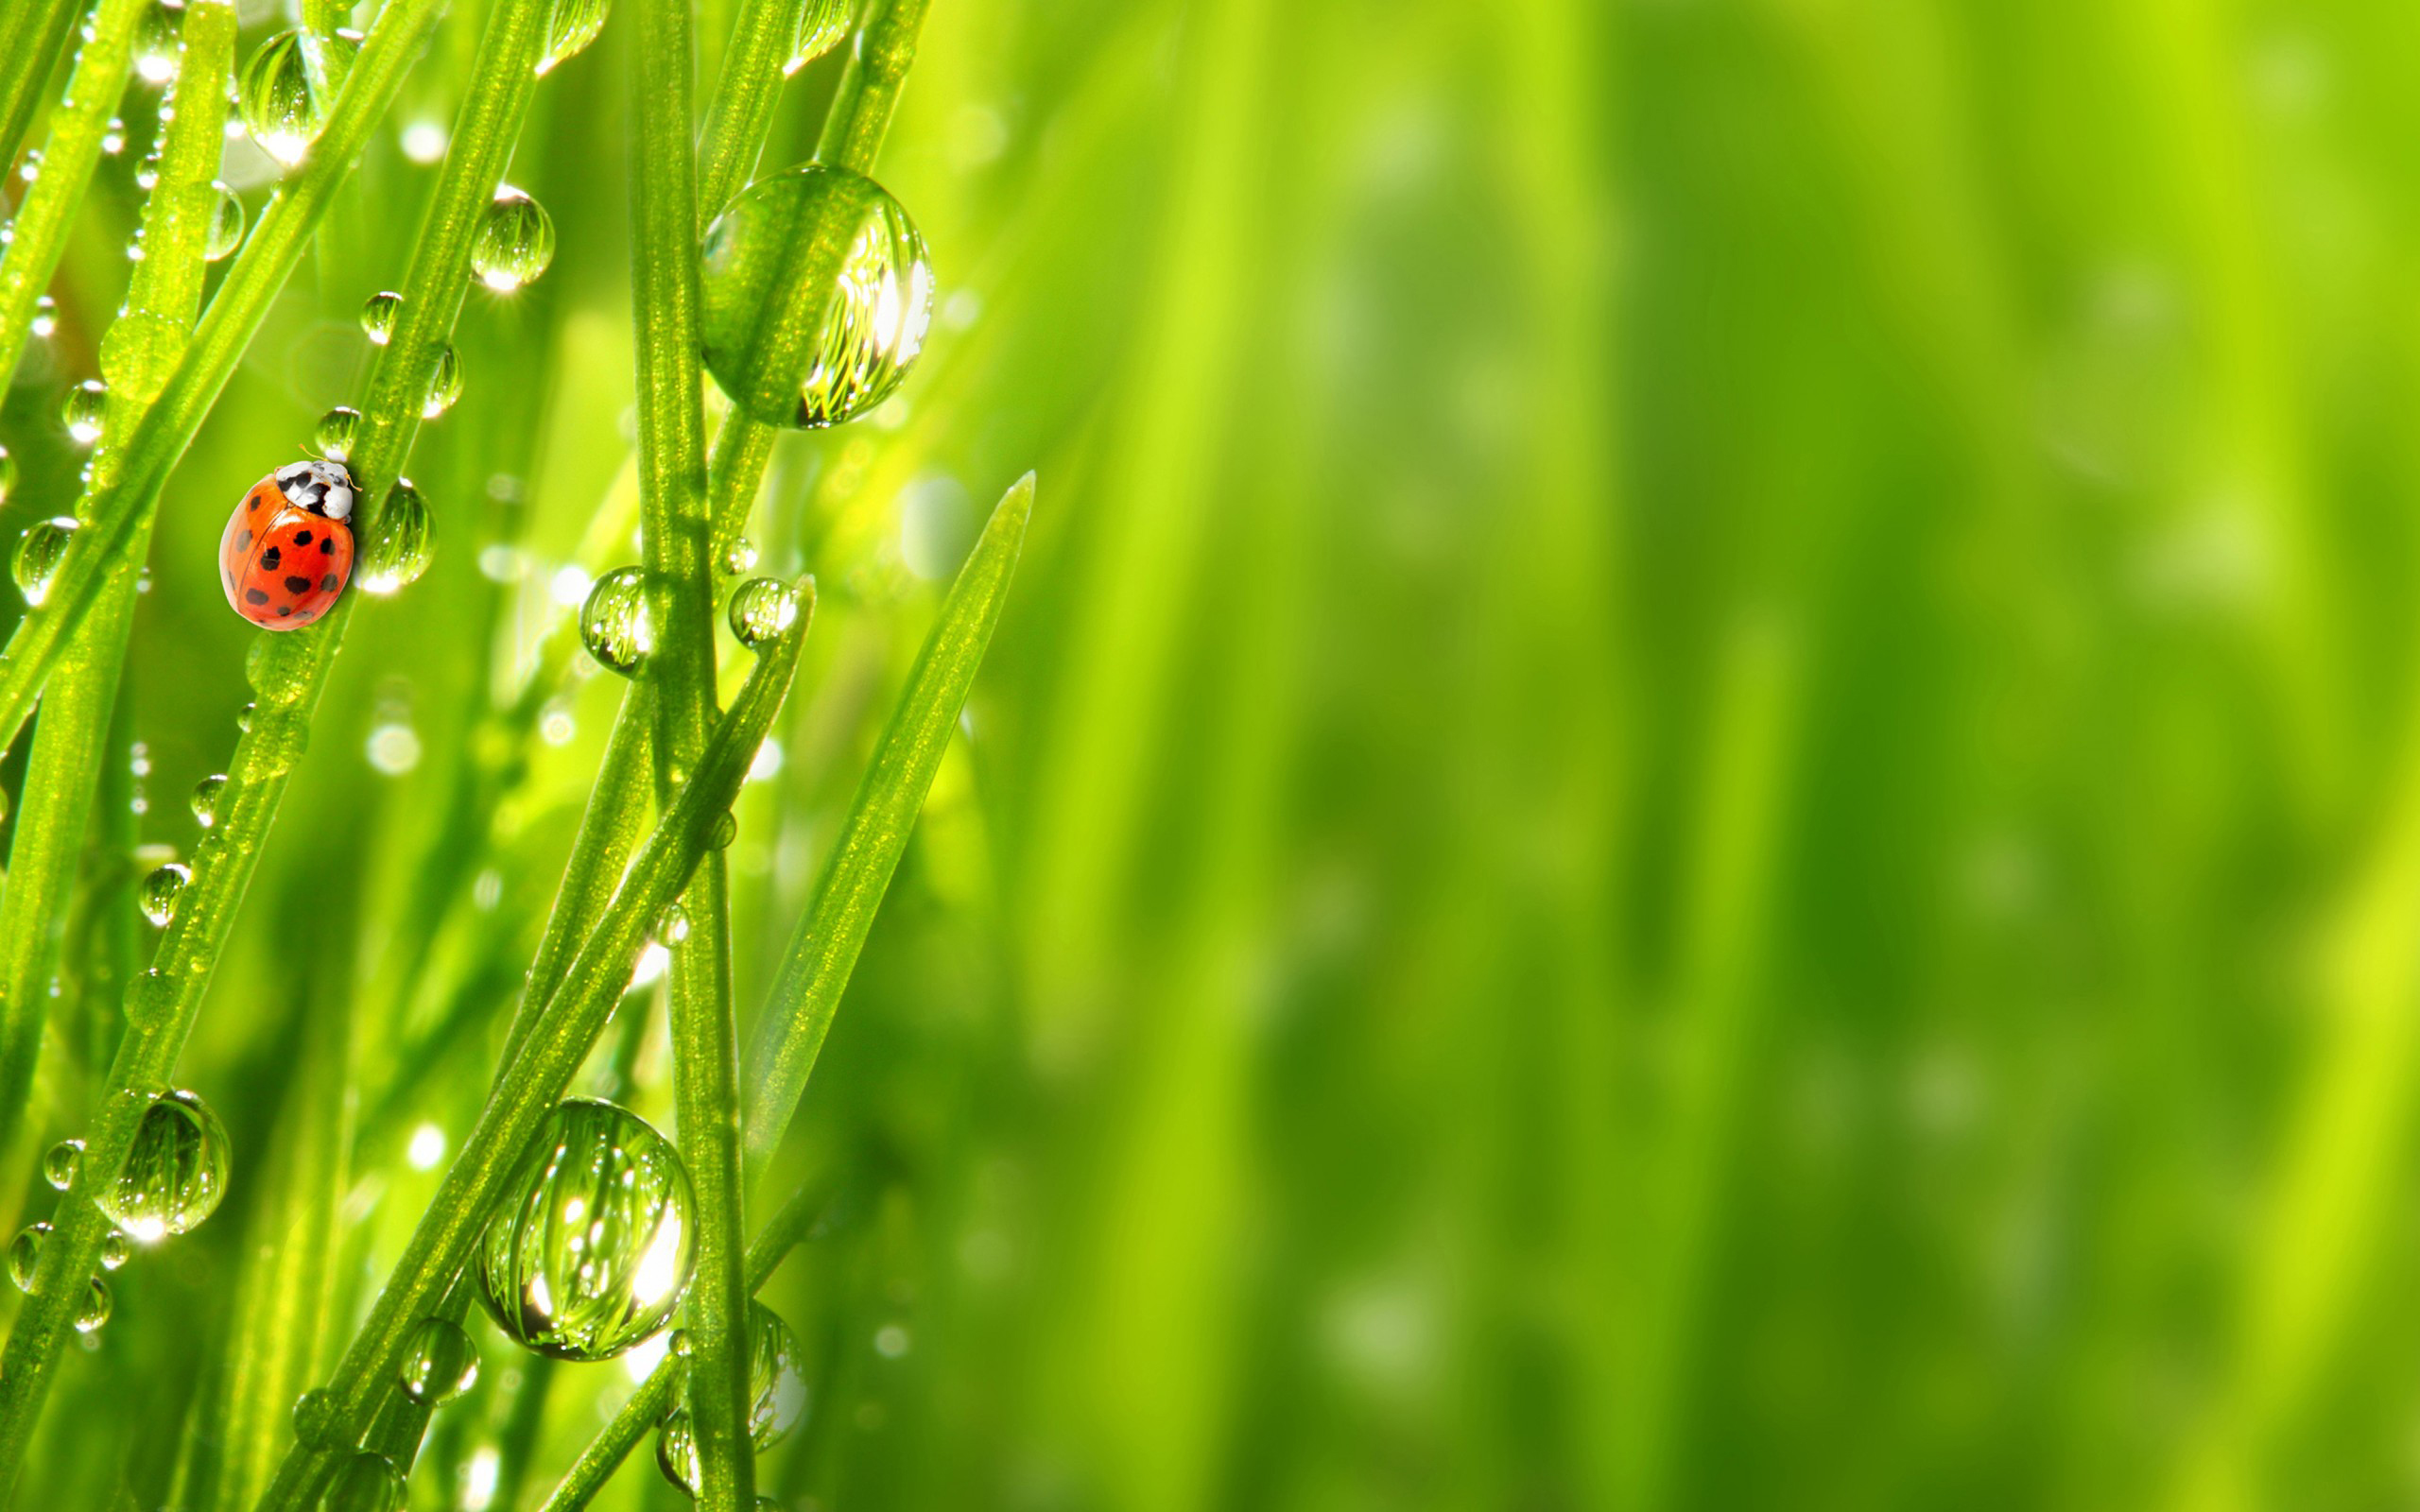 травинки капли бесплатно